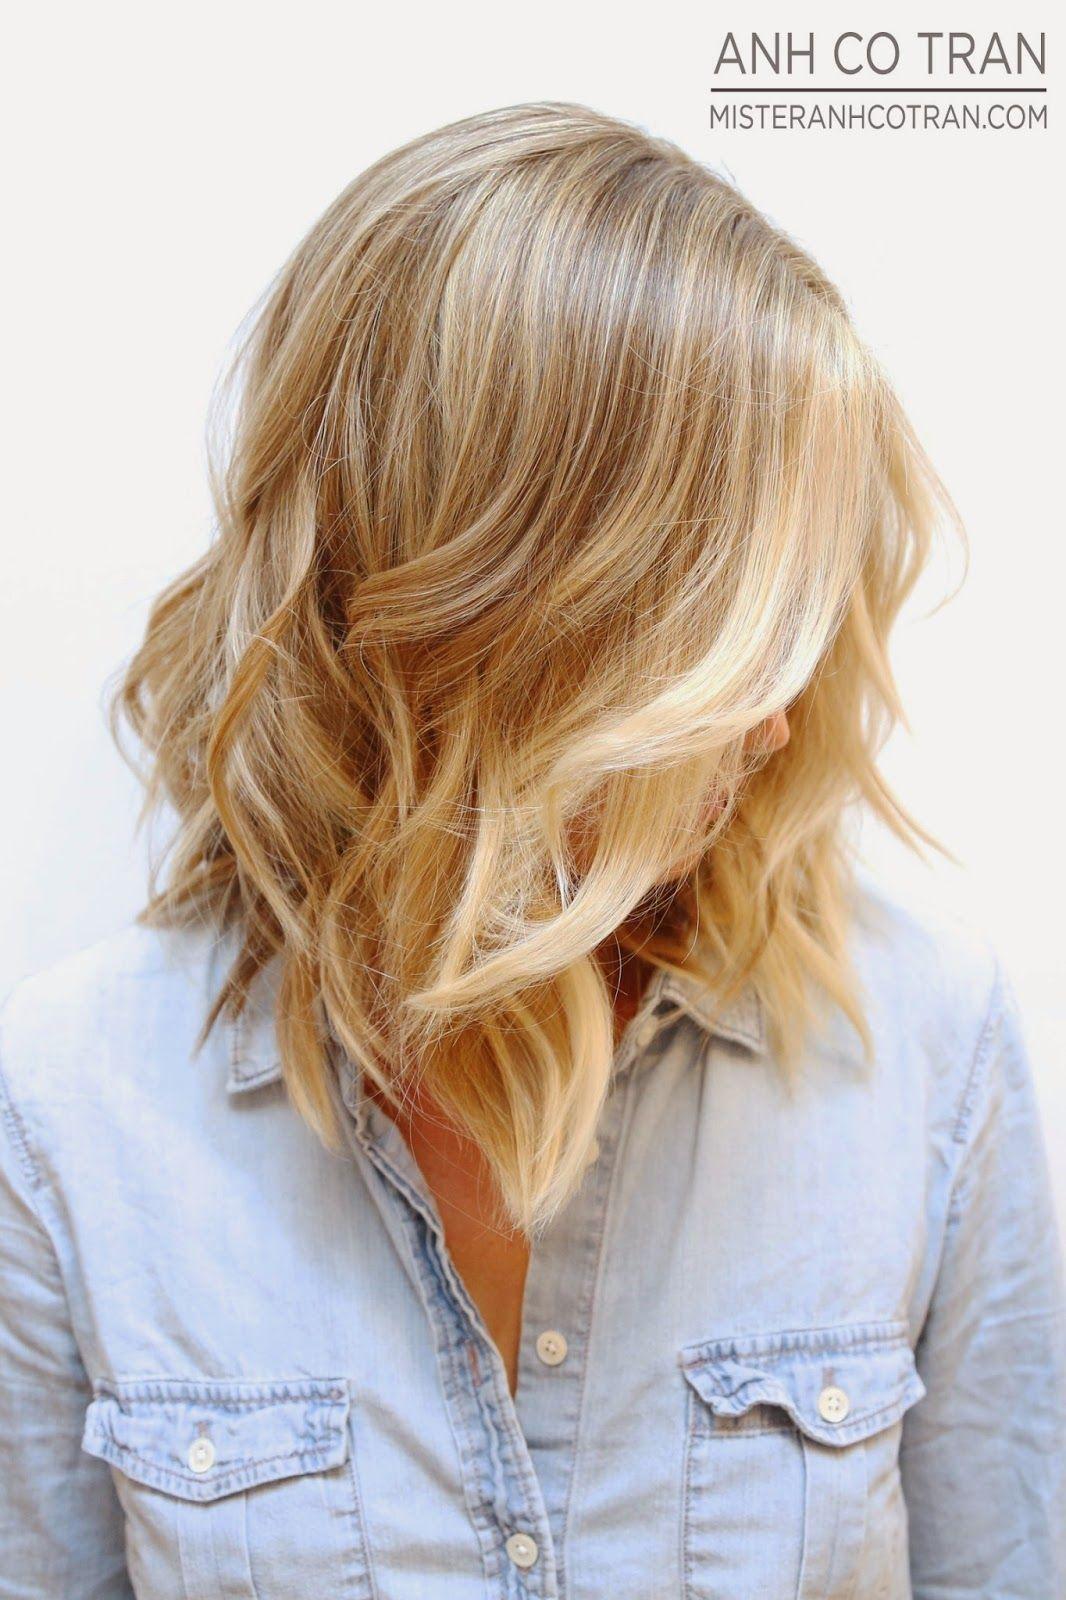 La beautiful and flowing hair at ramireztran salon cutstyle anh